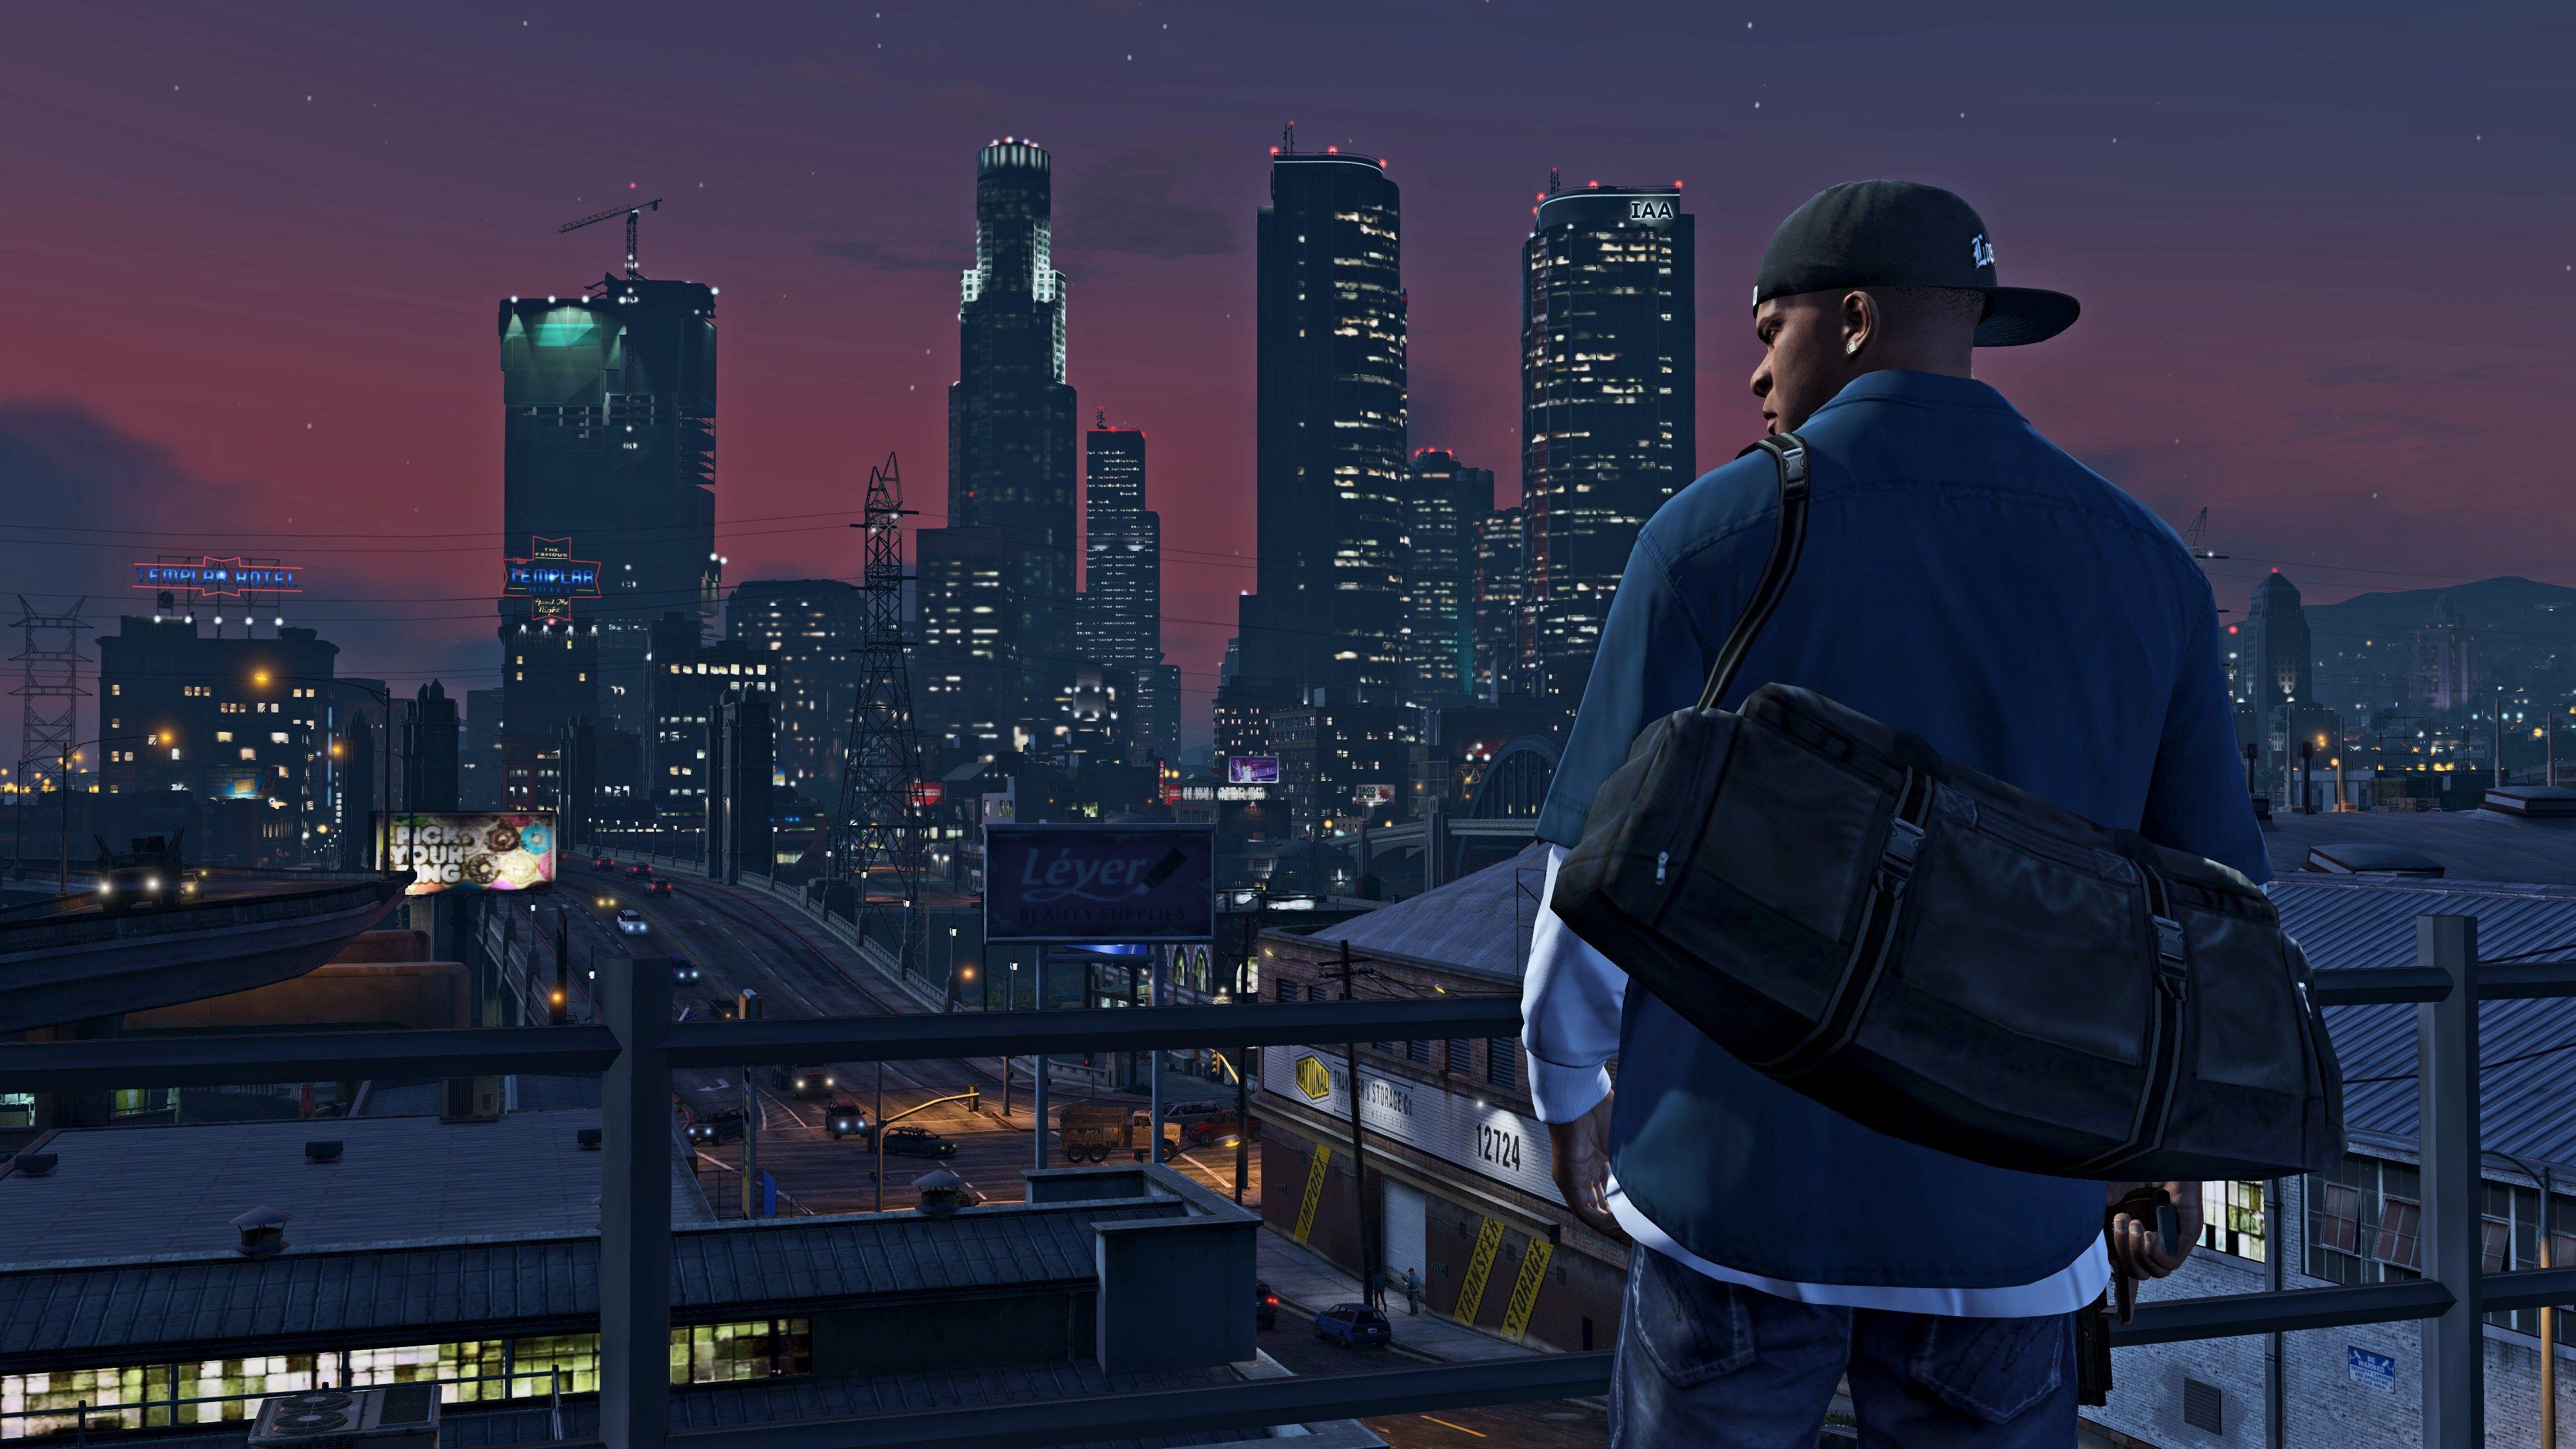 Grand Theft Auto V K Wallpaper X Grand Theft Auto Playstation Games